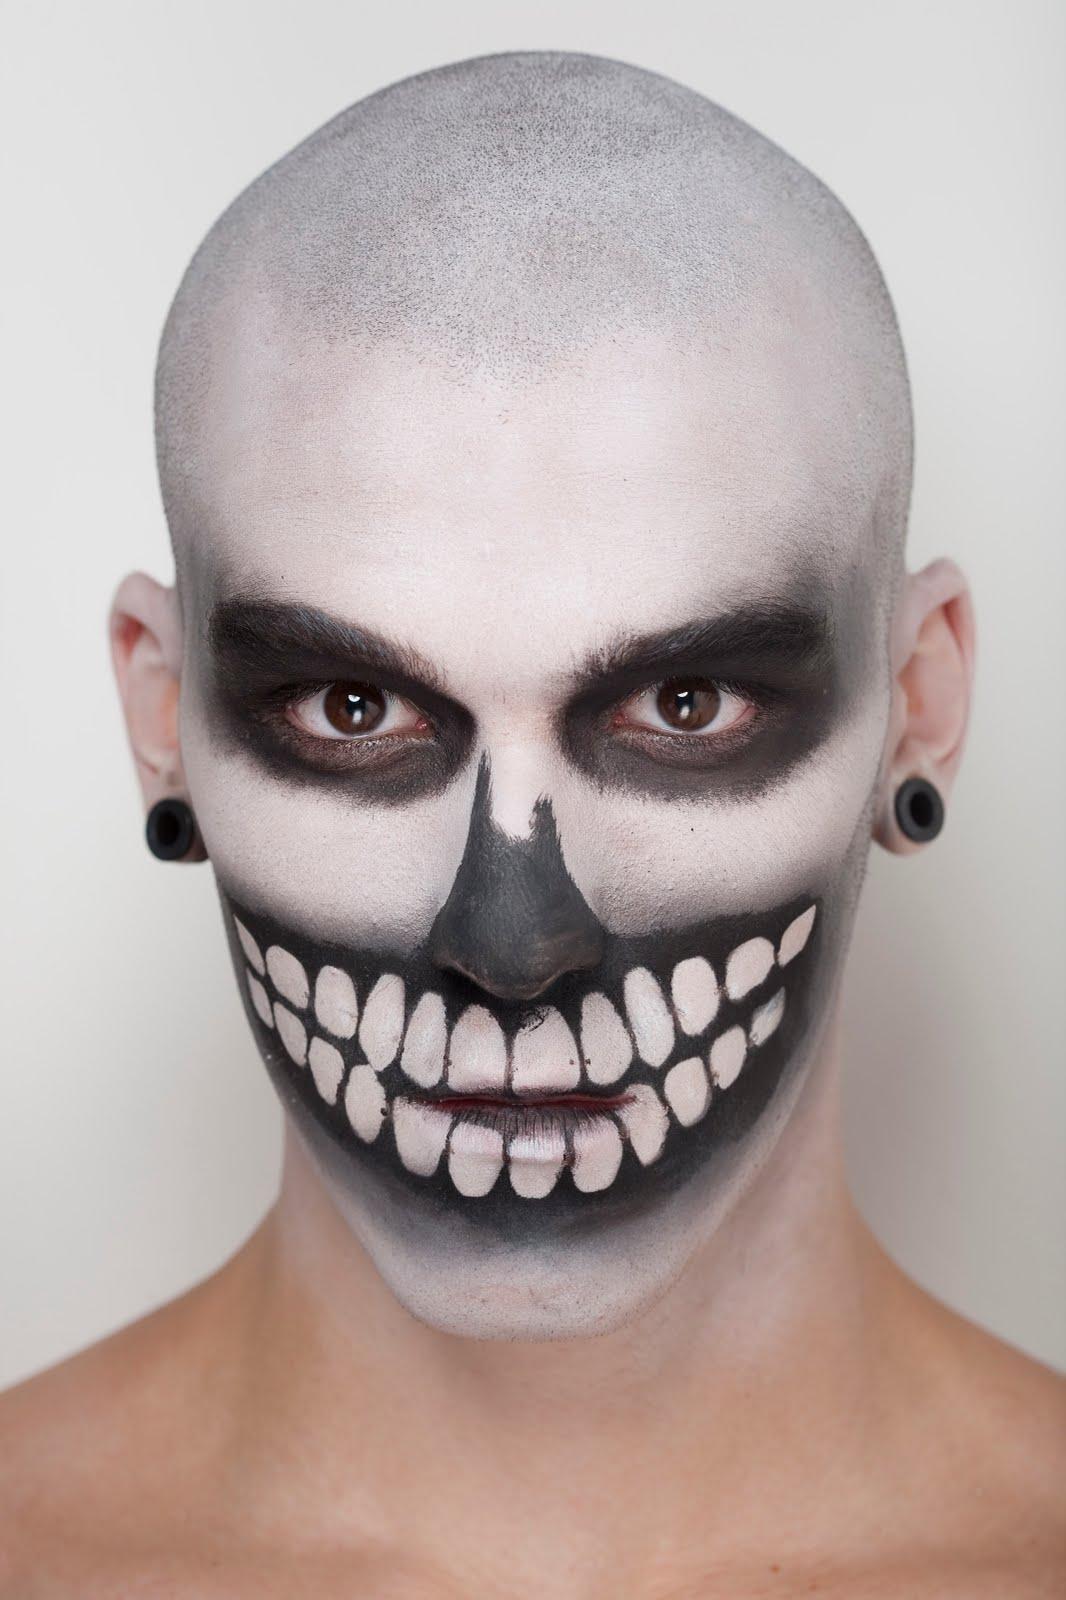 maquiagem de caveira, masculina, homens, Alexandre Herchcovitch, spfw, sao paulo fashion week